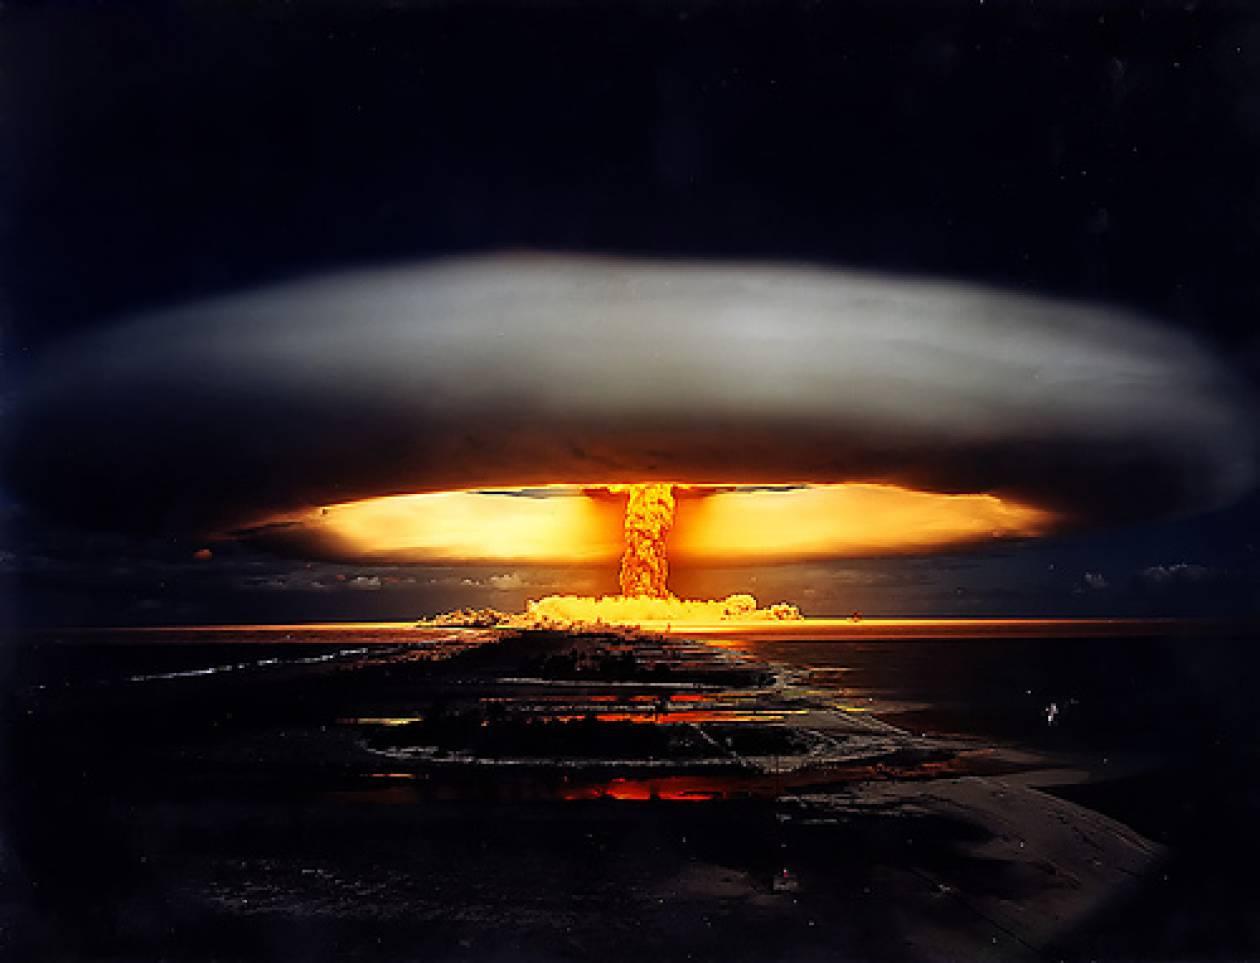 FW: Stuxnet: θα μπορούσε να προκαλέσει νέο Τσέρνομπιλ